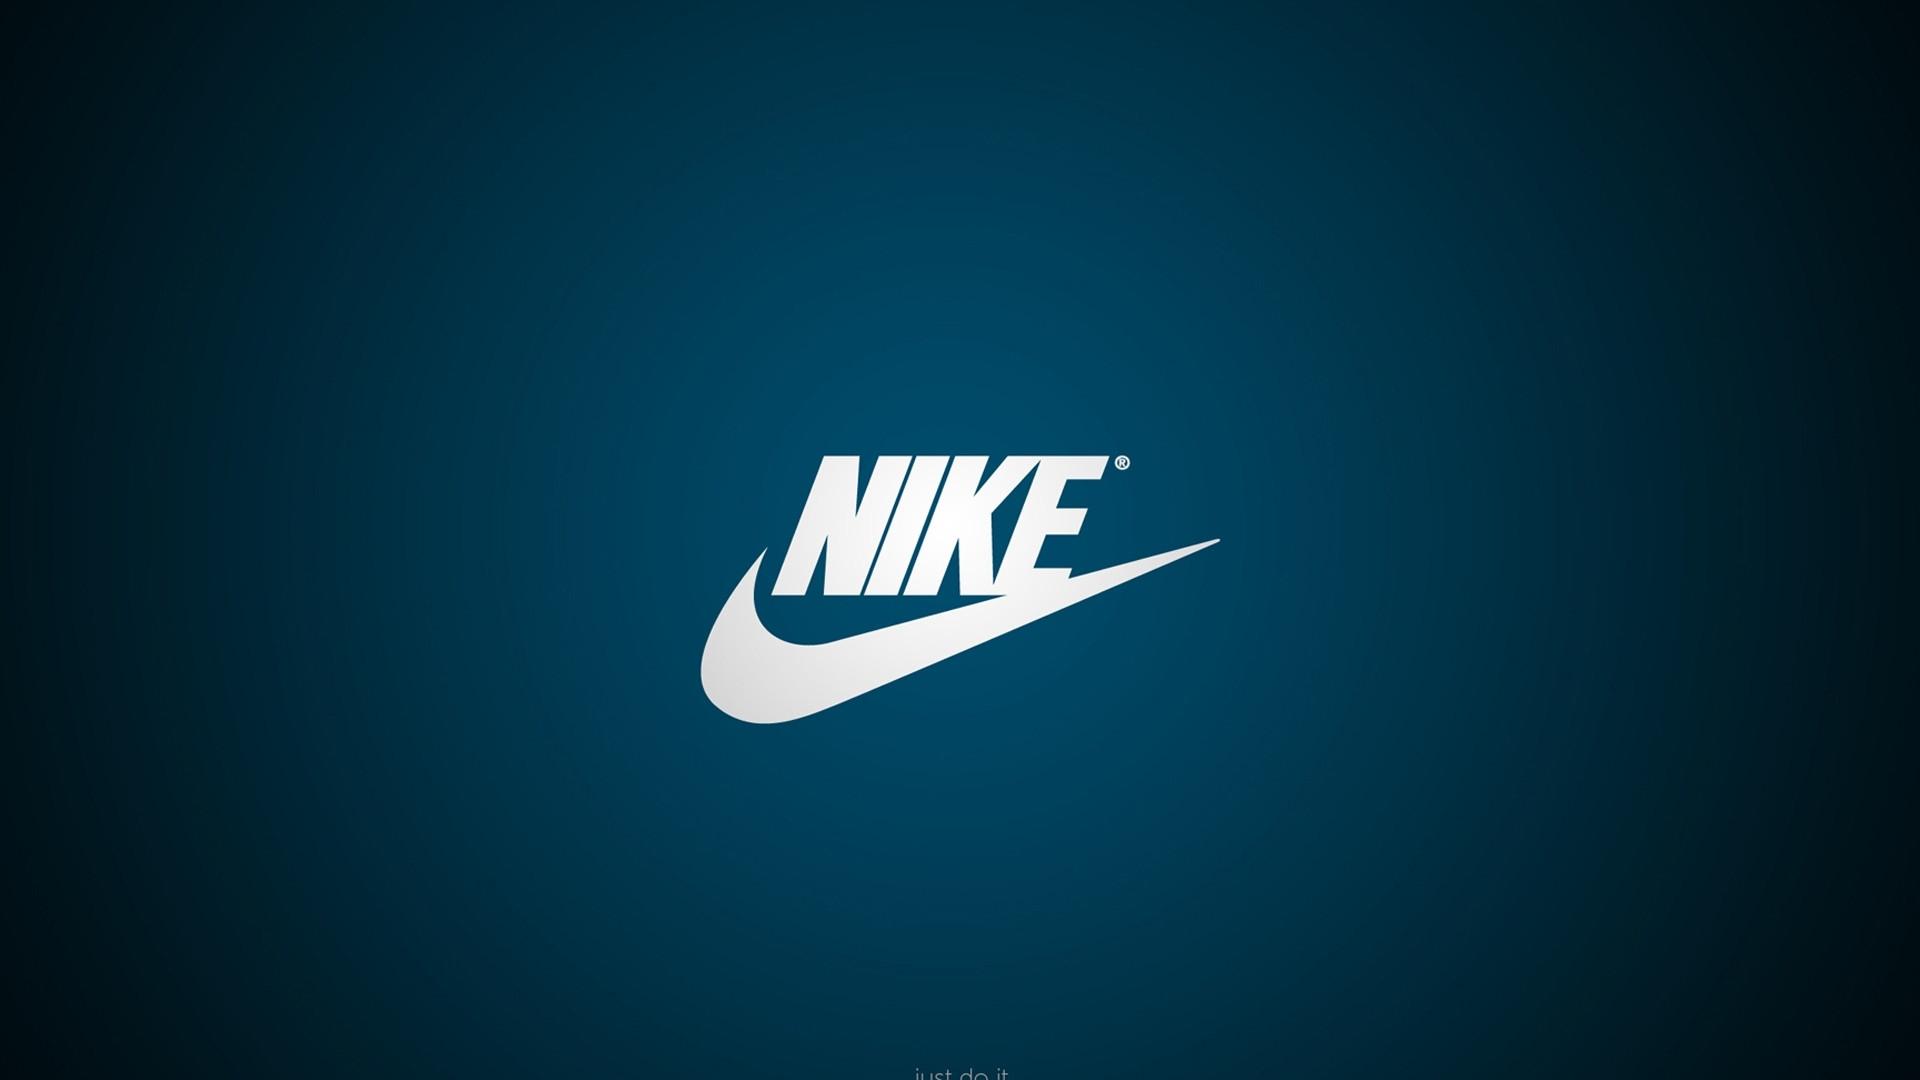 New York Yankees Wallpaper For Iphone 5 Nike Wallpaper Backgrounds 183 ① Wallpapertag